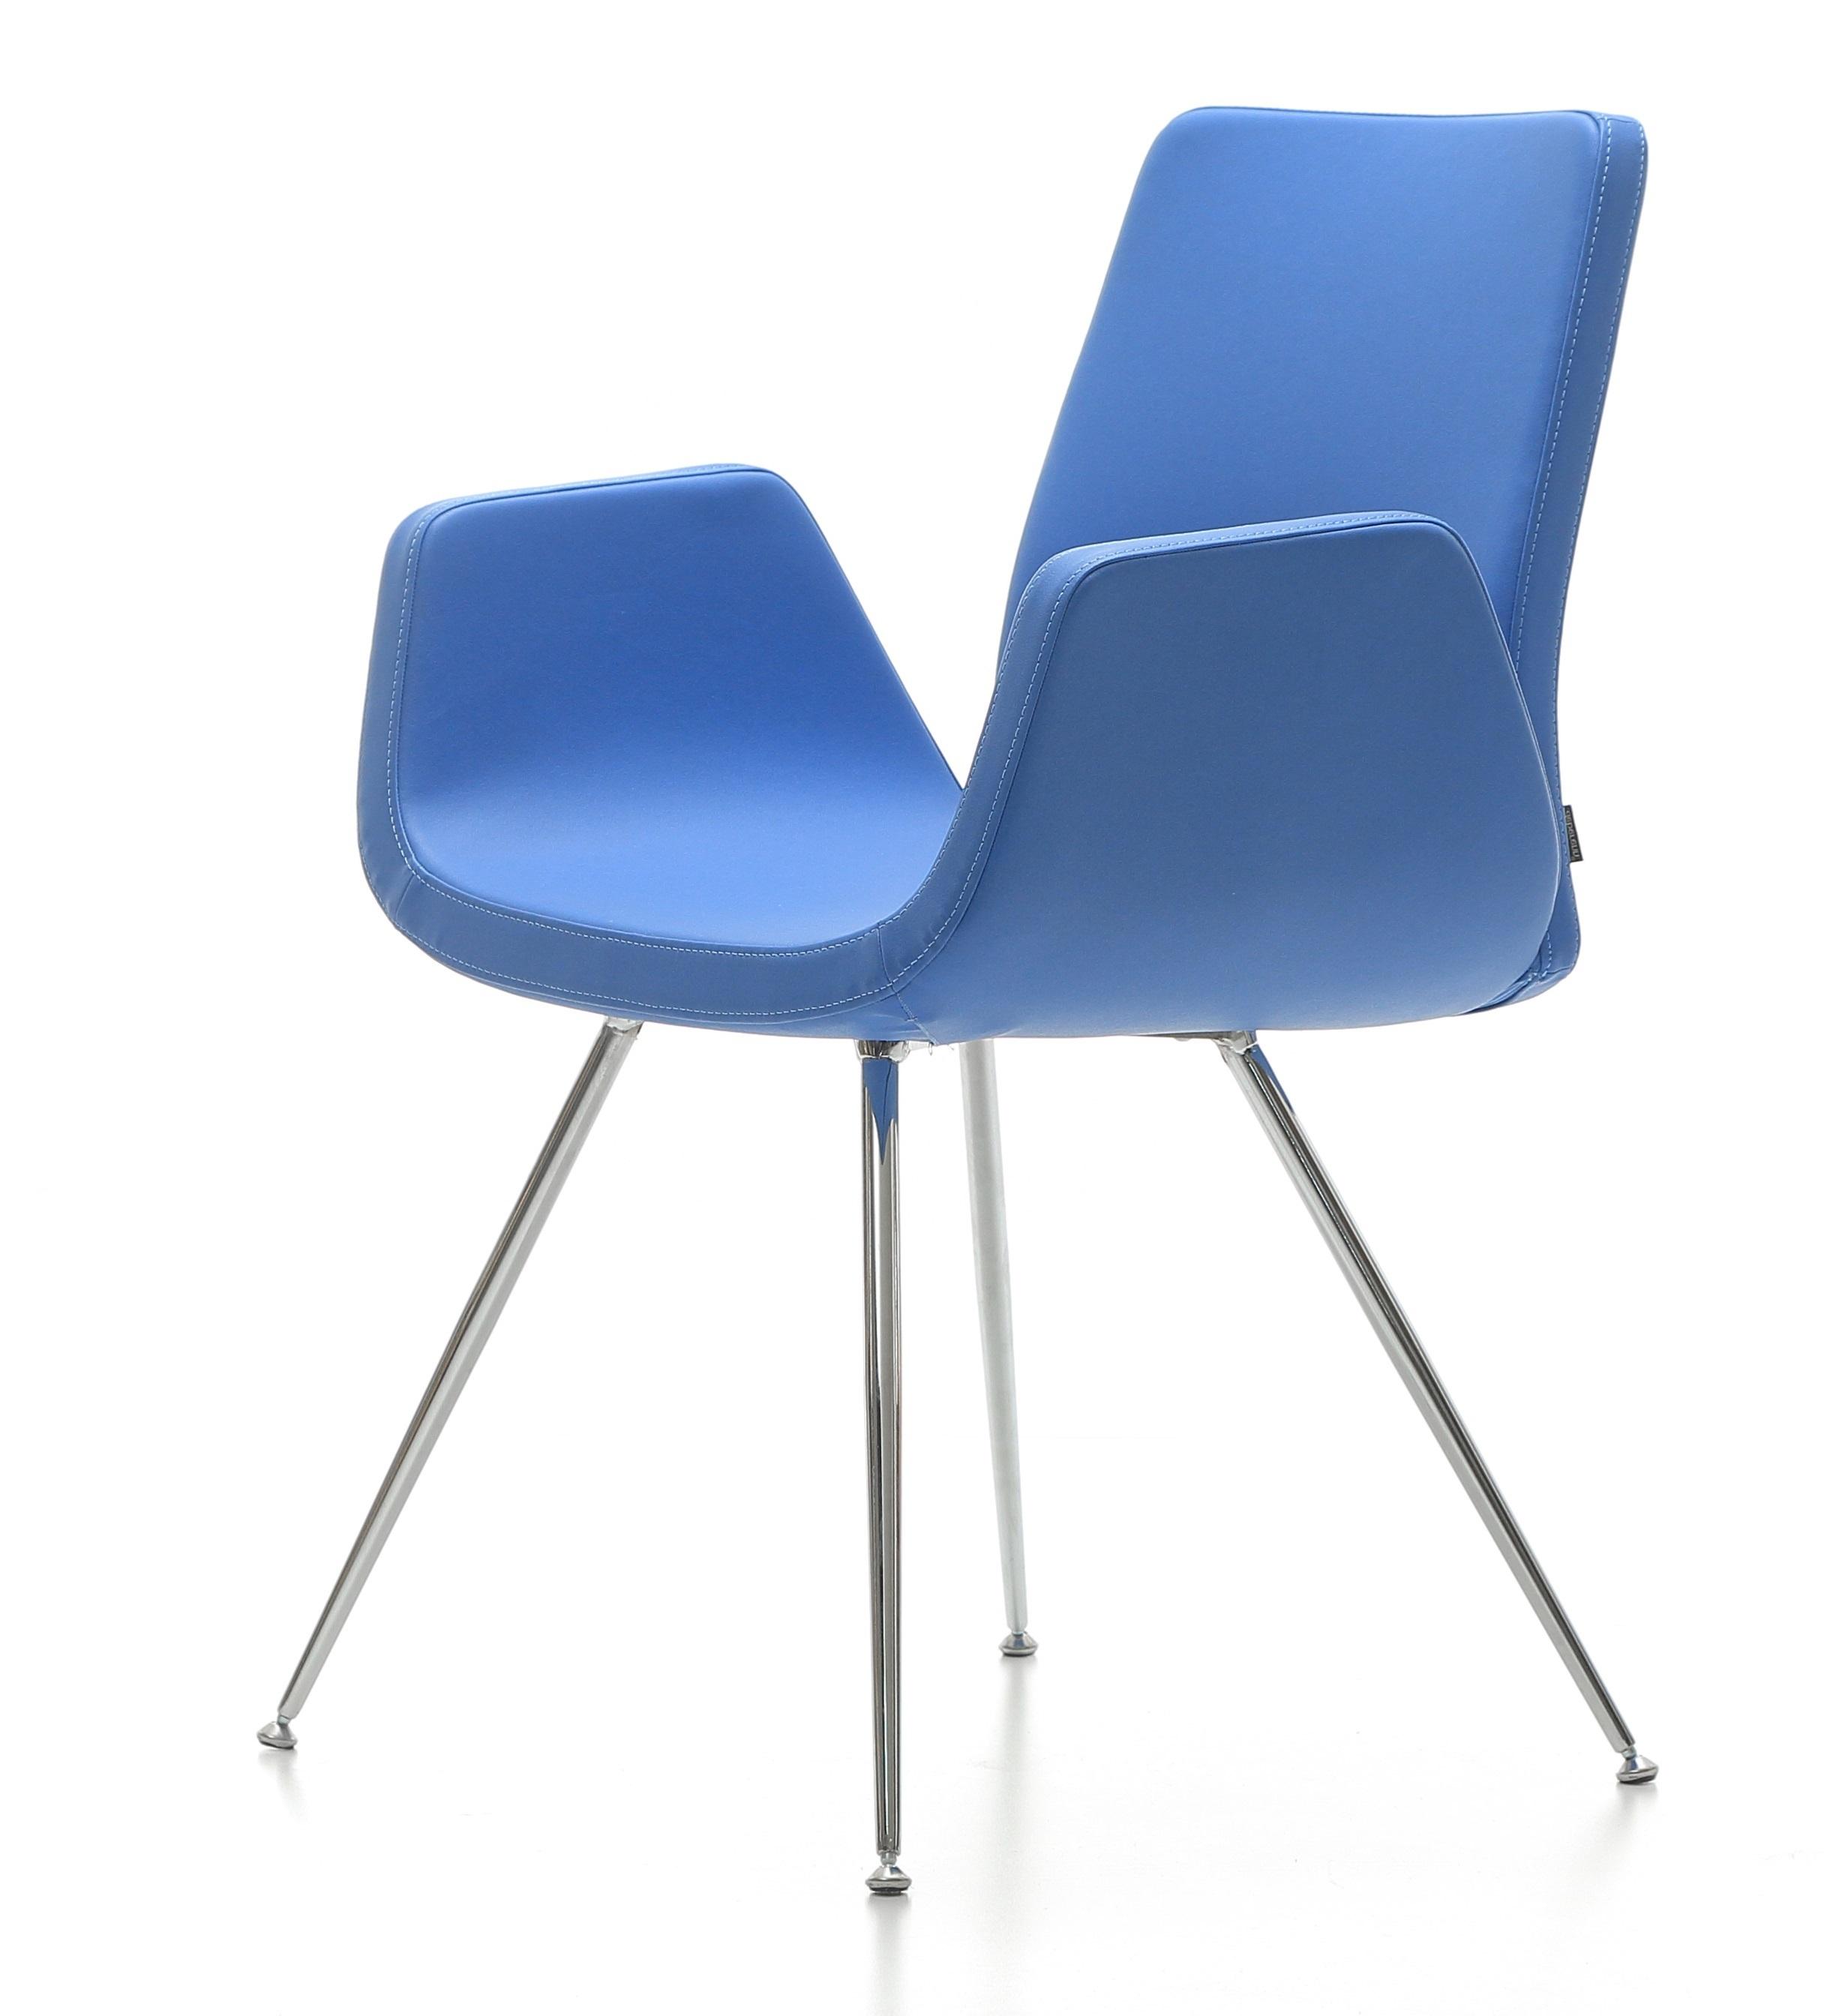 Blauwe Design Stoelen.Tijdloze Stoel Nero Hs831